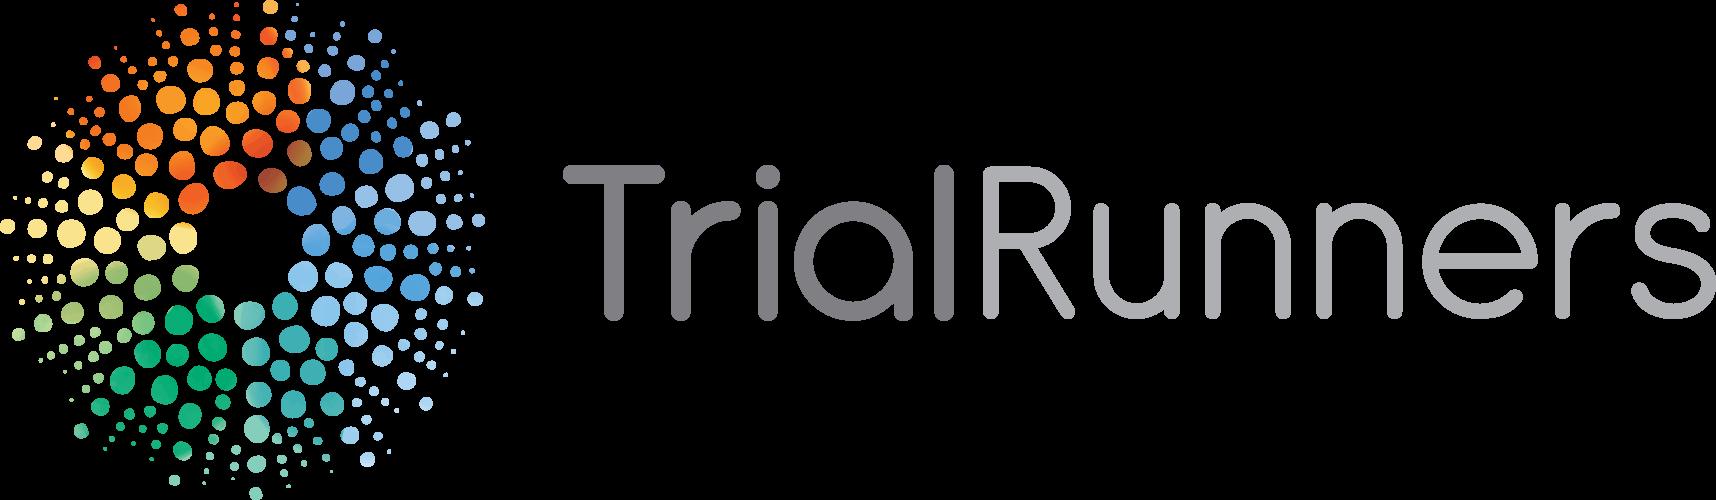 Trial Runners